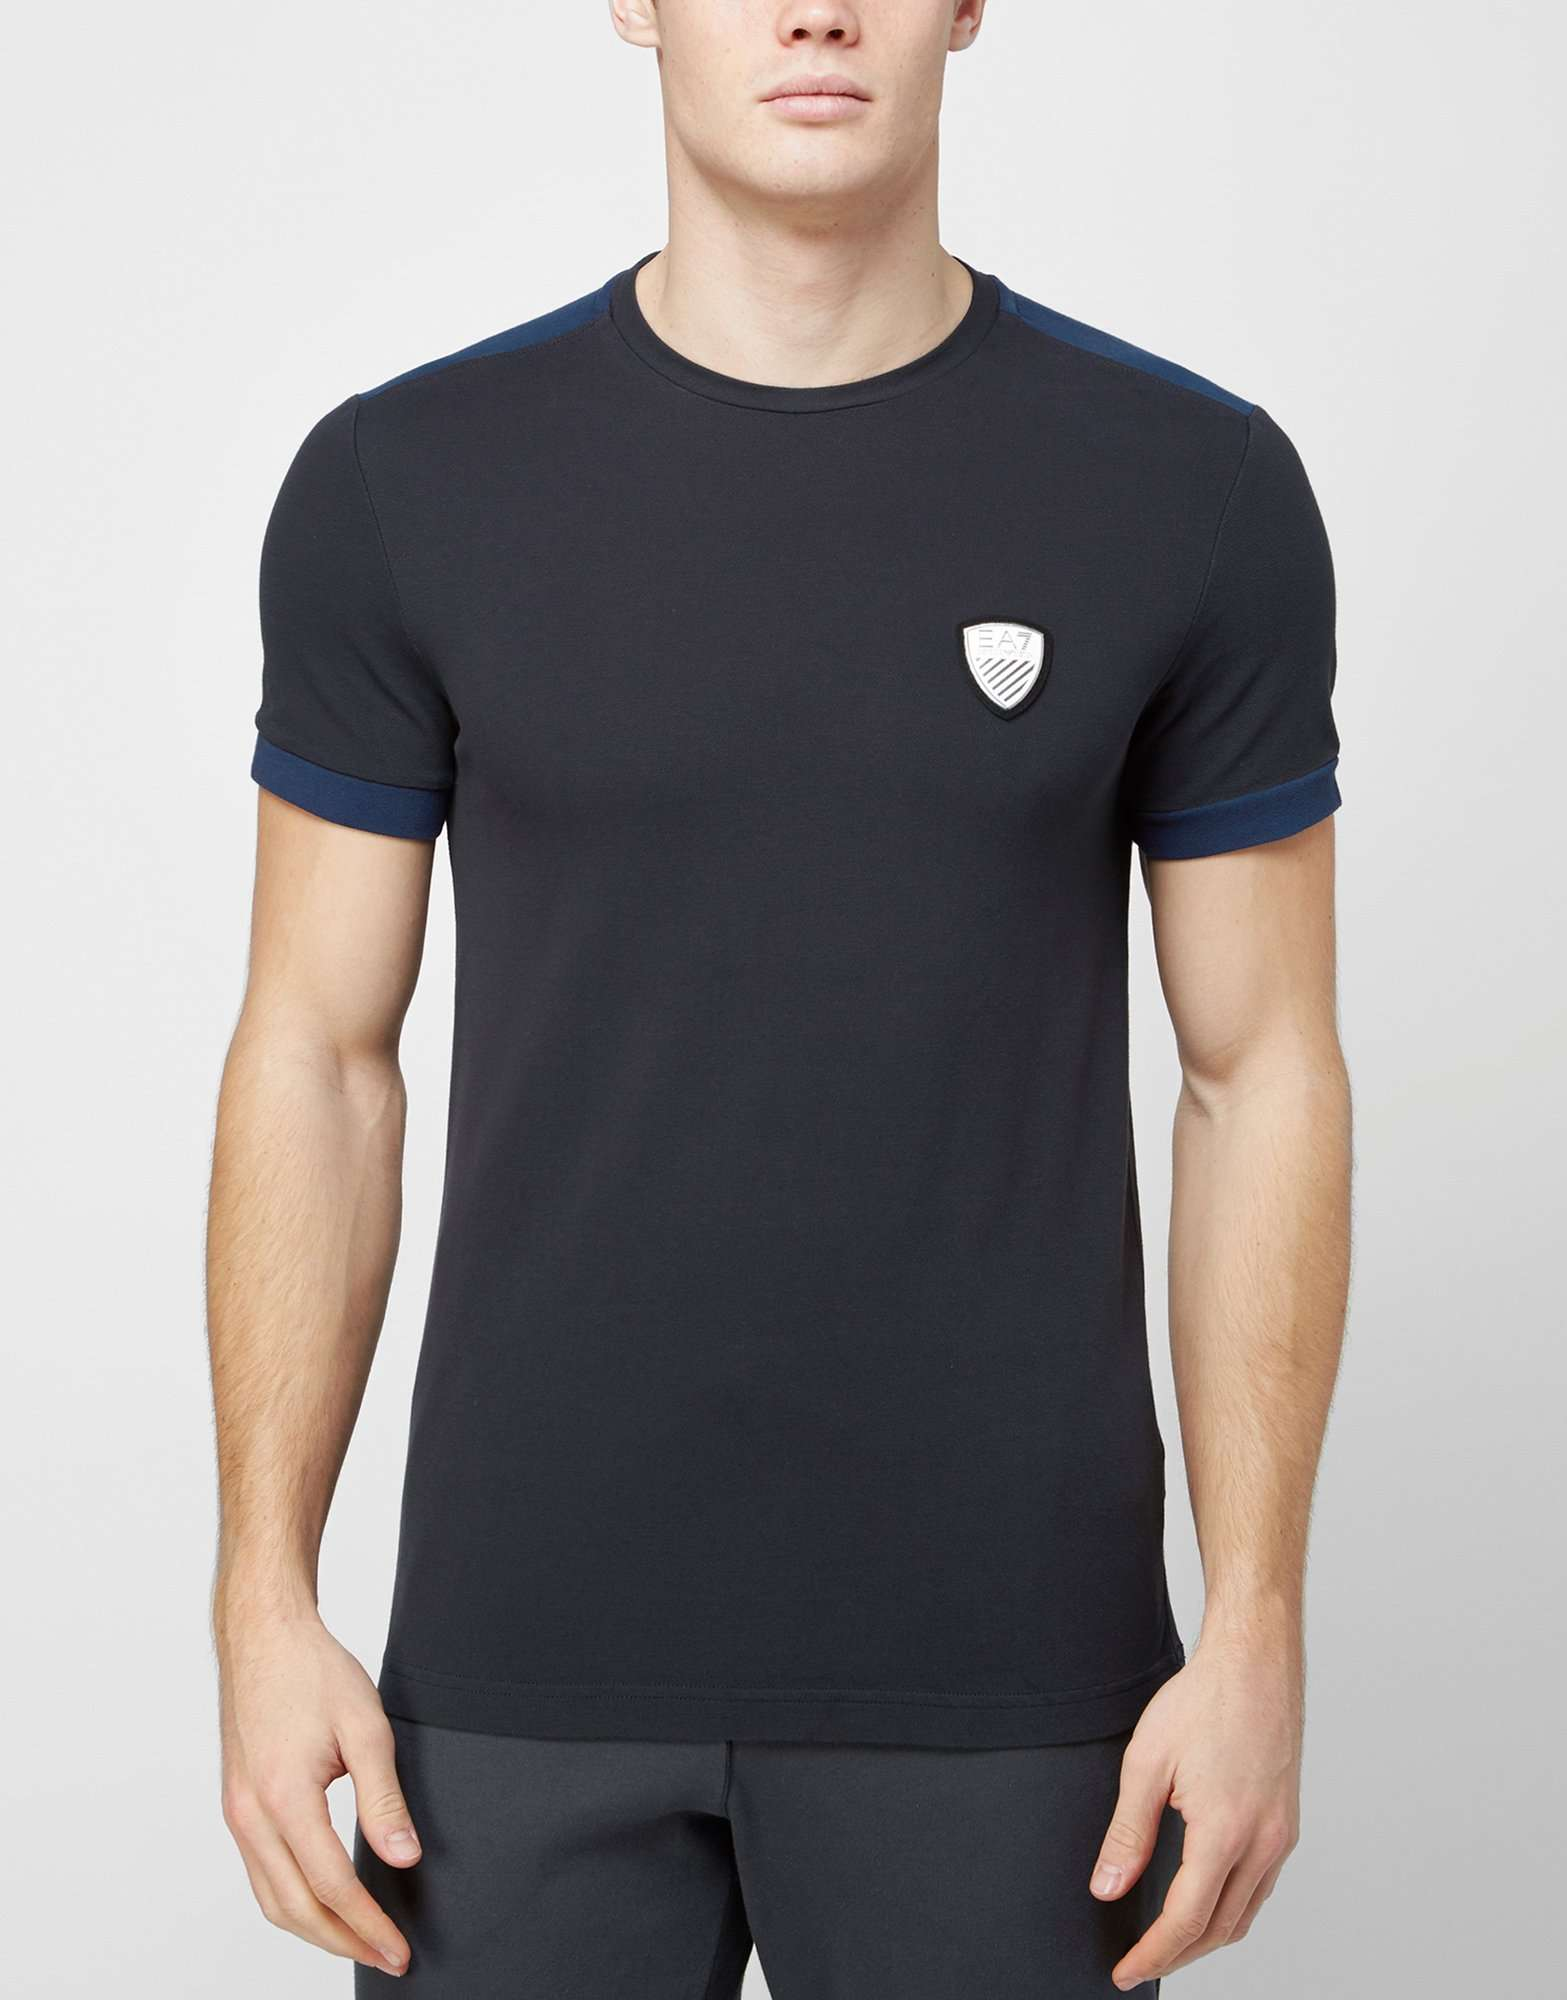 emporio armani ea7 pique t shirt scotts menswear. Black Bedroom Furniture Sets. Home Design Ideas